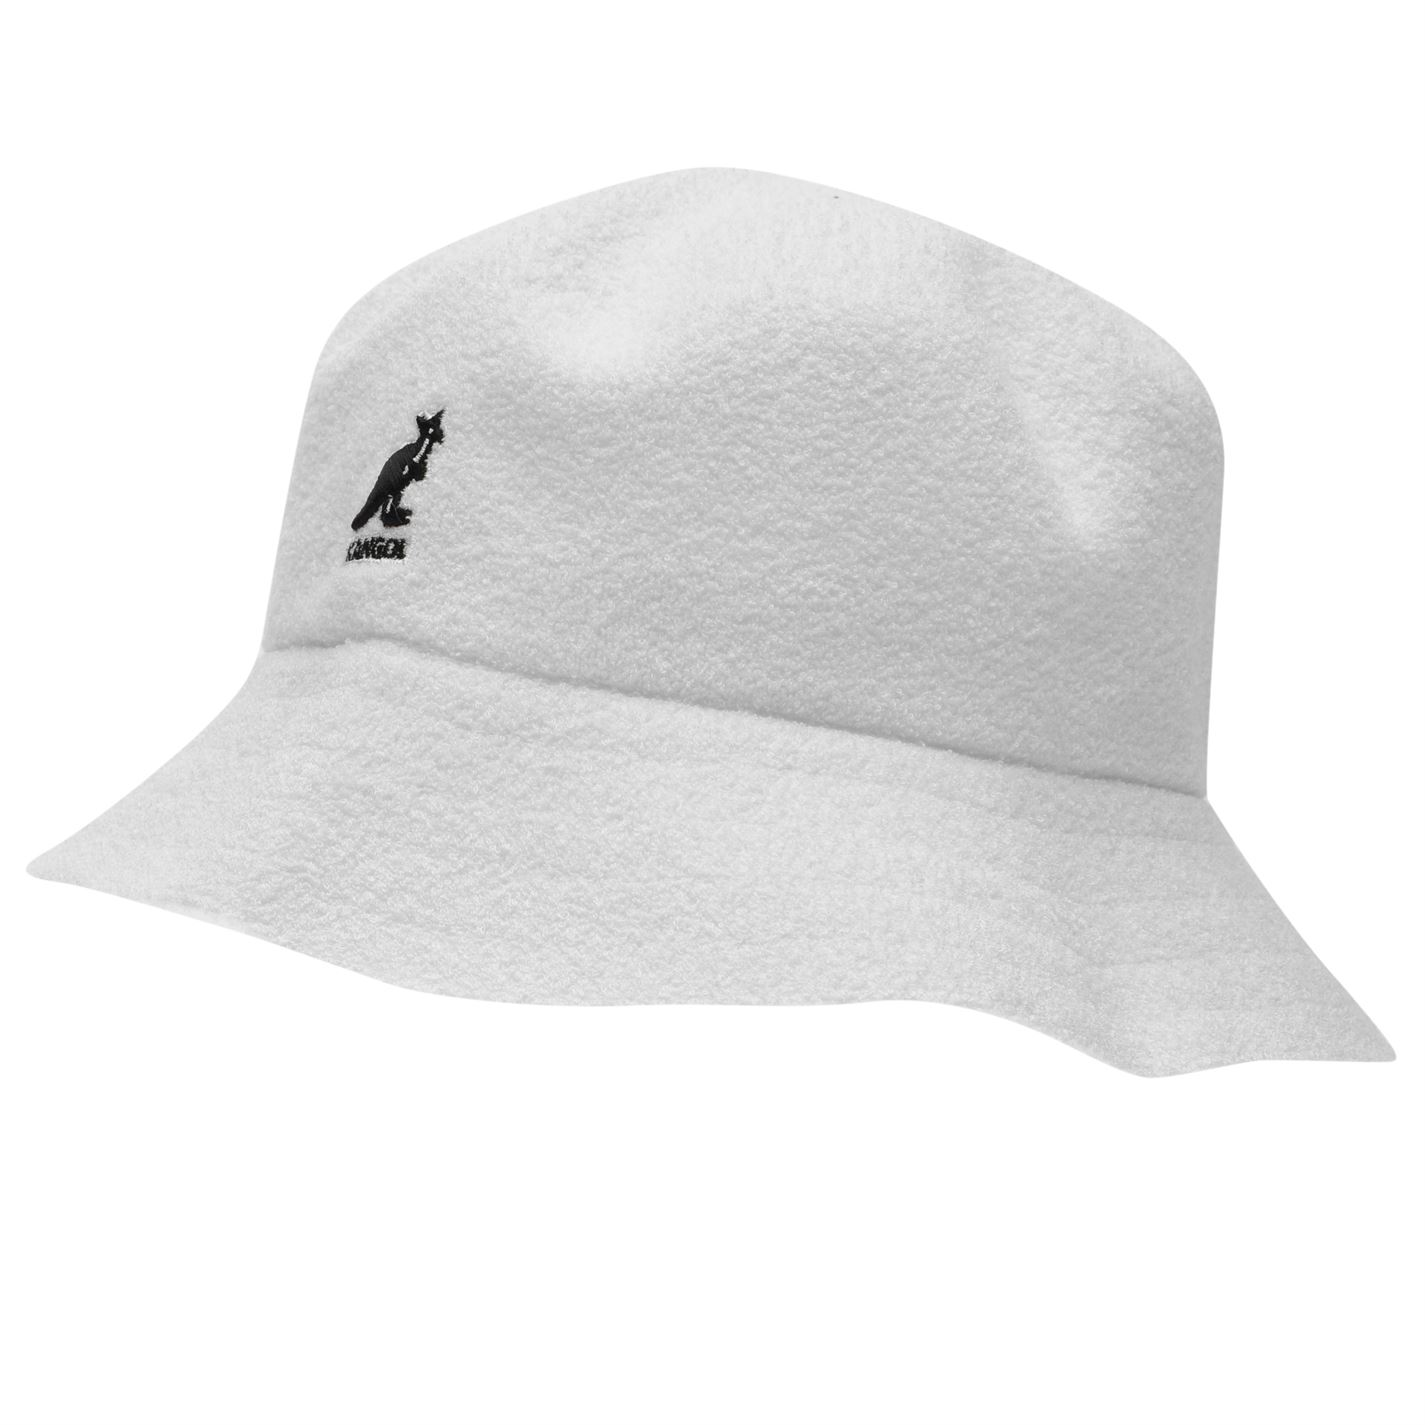 Mens Kangol Boucle Bucket Hat New  602f1a14e9c